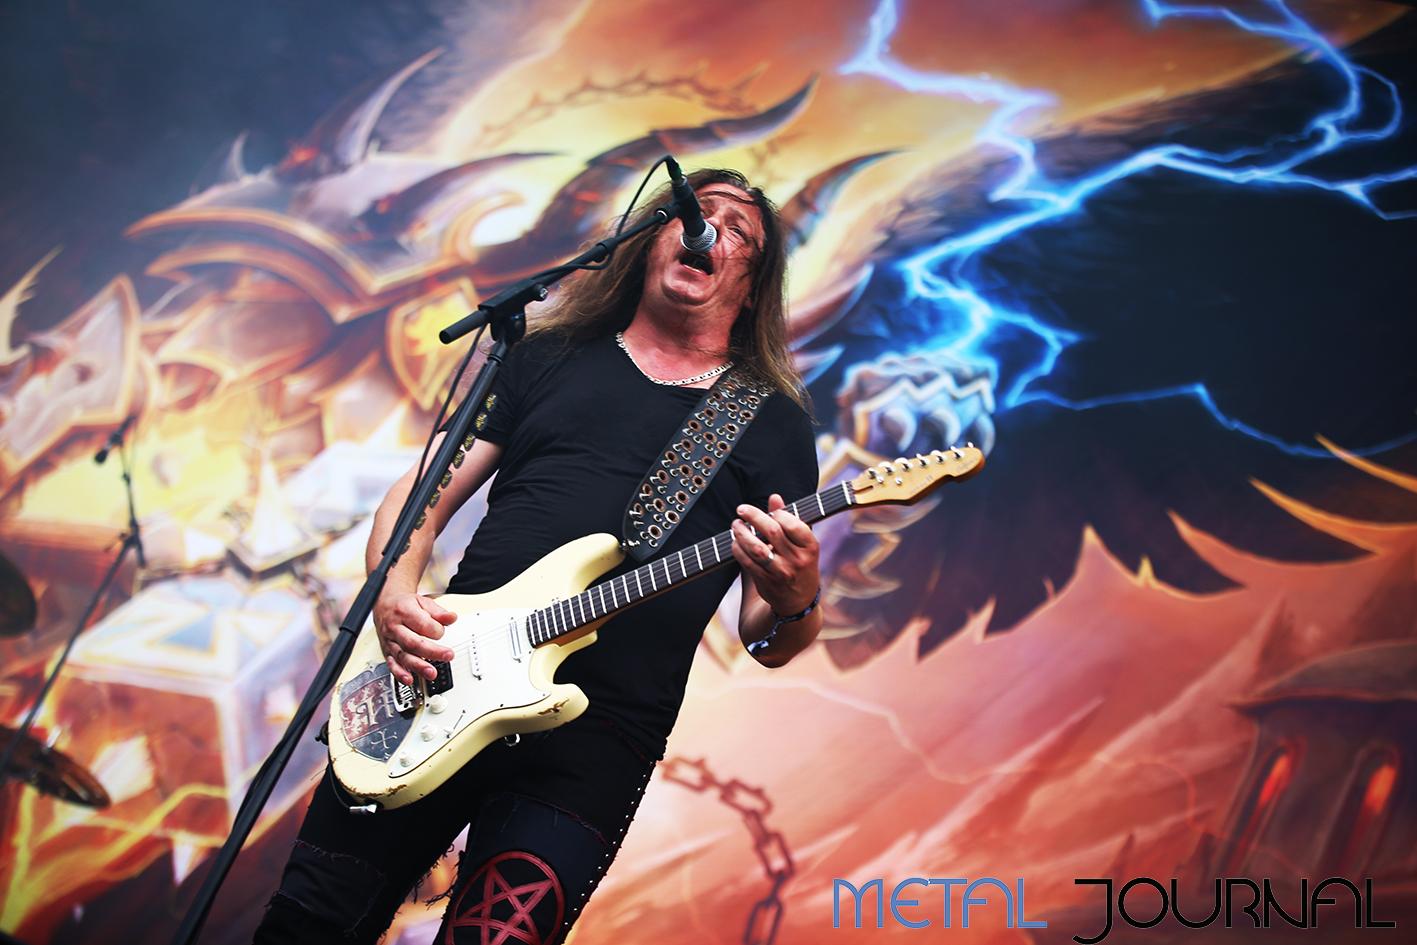 hammerfall - metal journal rock fest barcelona 2019 pic 5